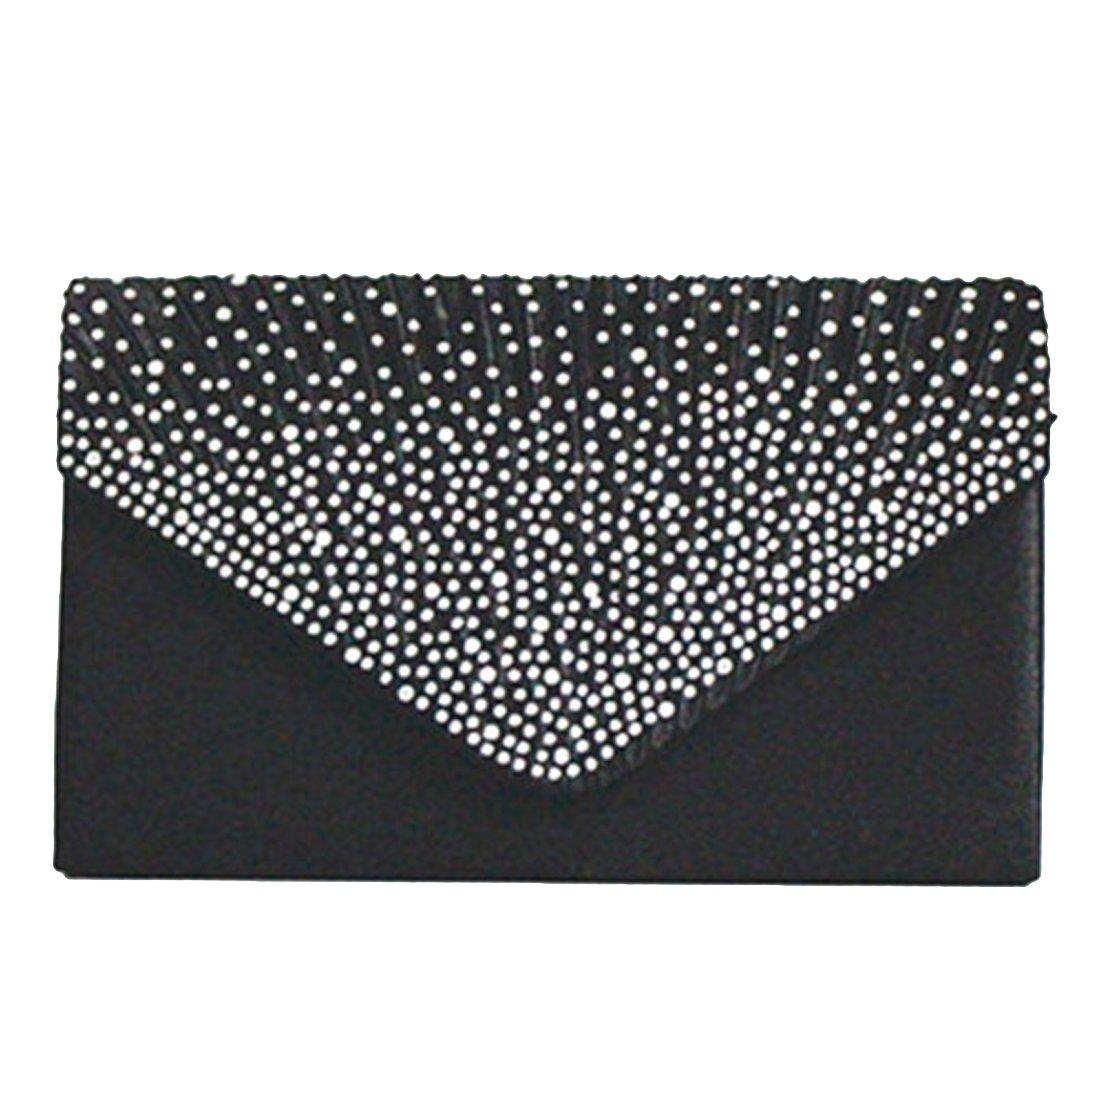 Women Evening Envelope Rhinestone Frosted Handbag Party Bridal Clutch Purse for Wedding Ladies Ideal Gift (Black)